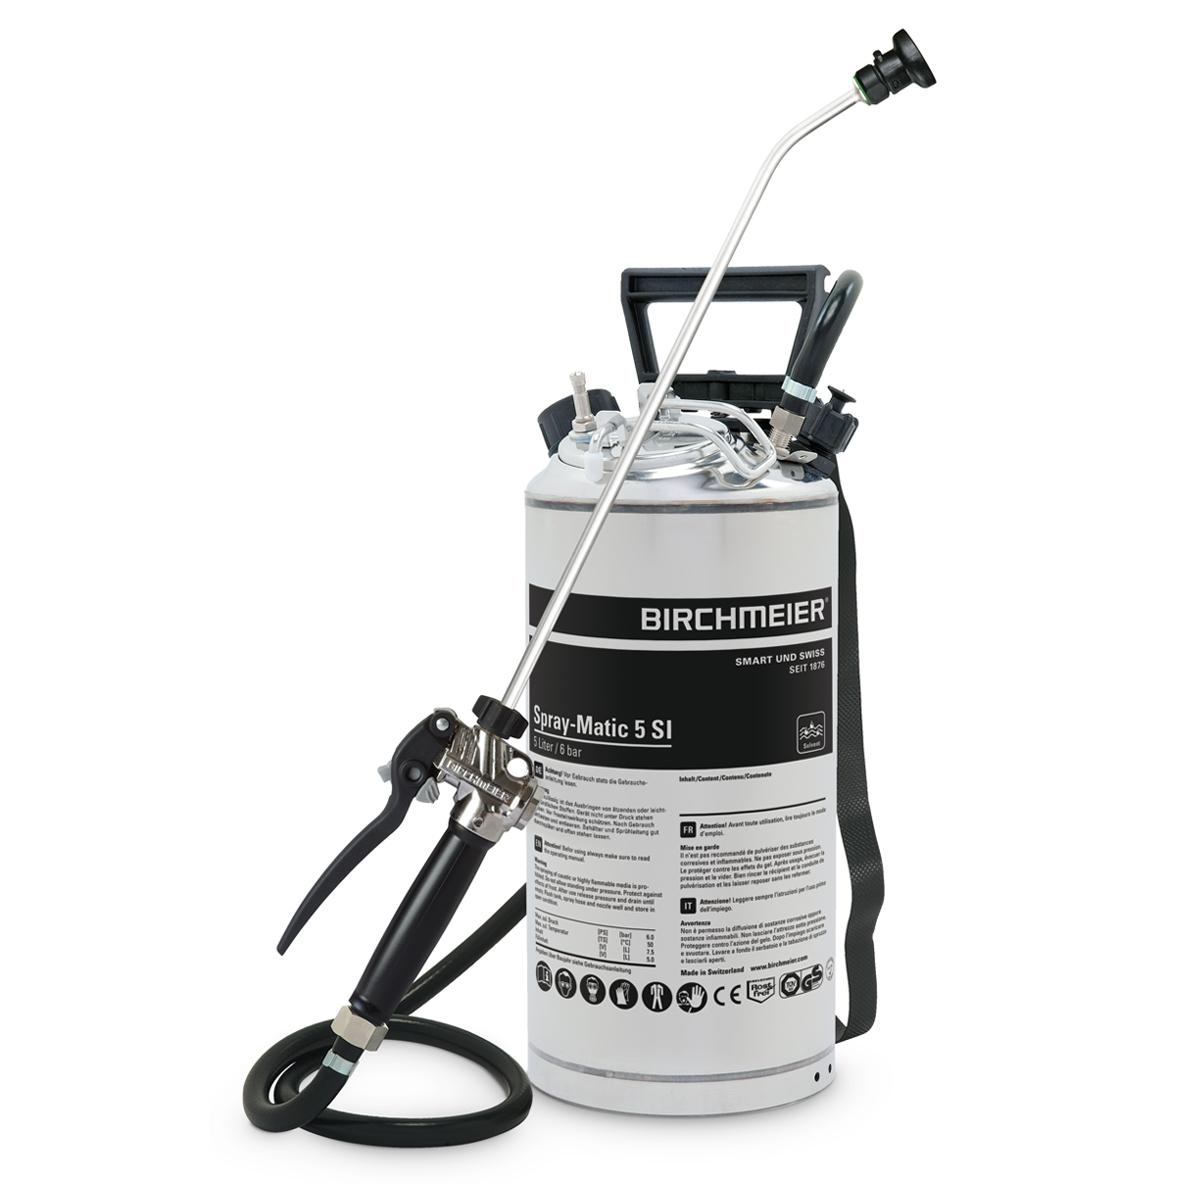 Birchmeier druksproeier met persluchtaansluiting Spray Matic 5 Sl